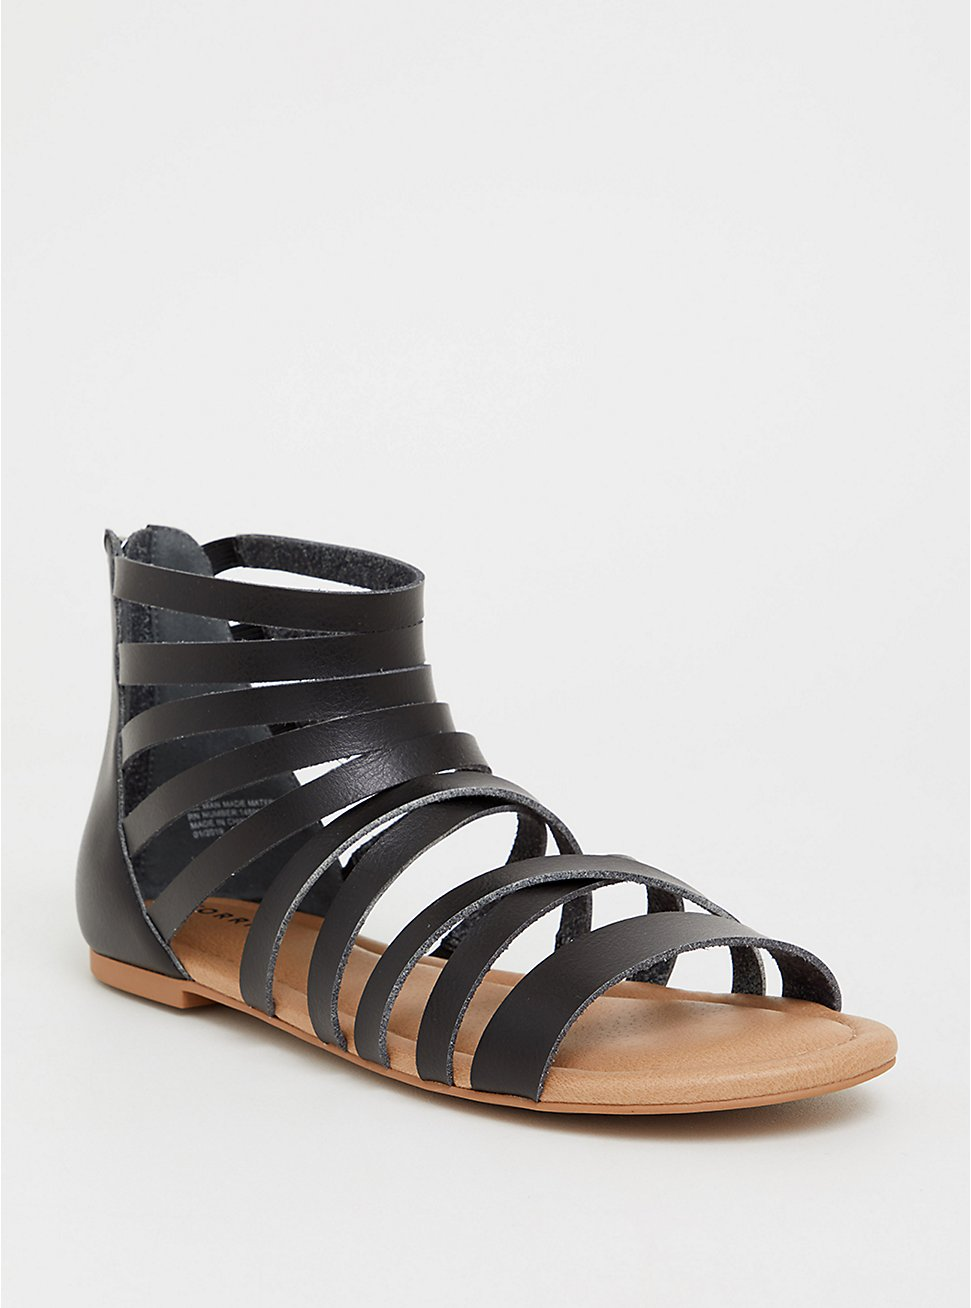 Plus Size Black Faux Leather Gladiator Sandal (WW), BLACK, hi-res